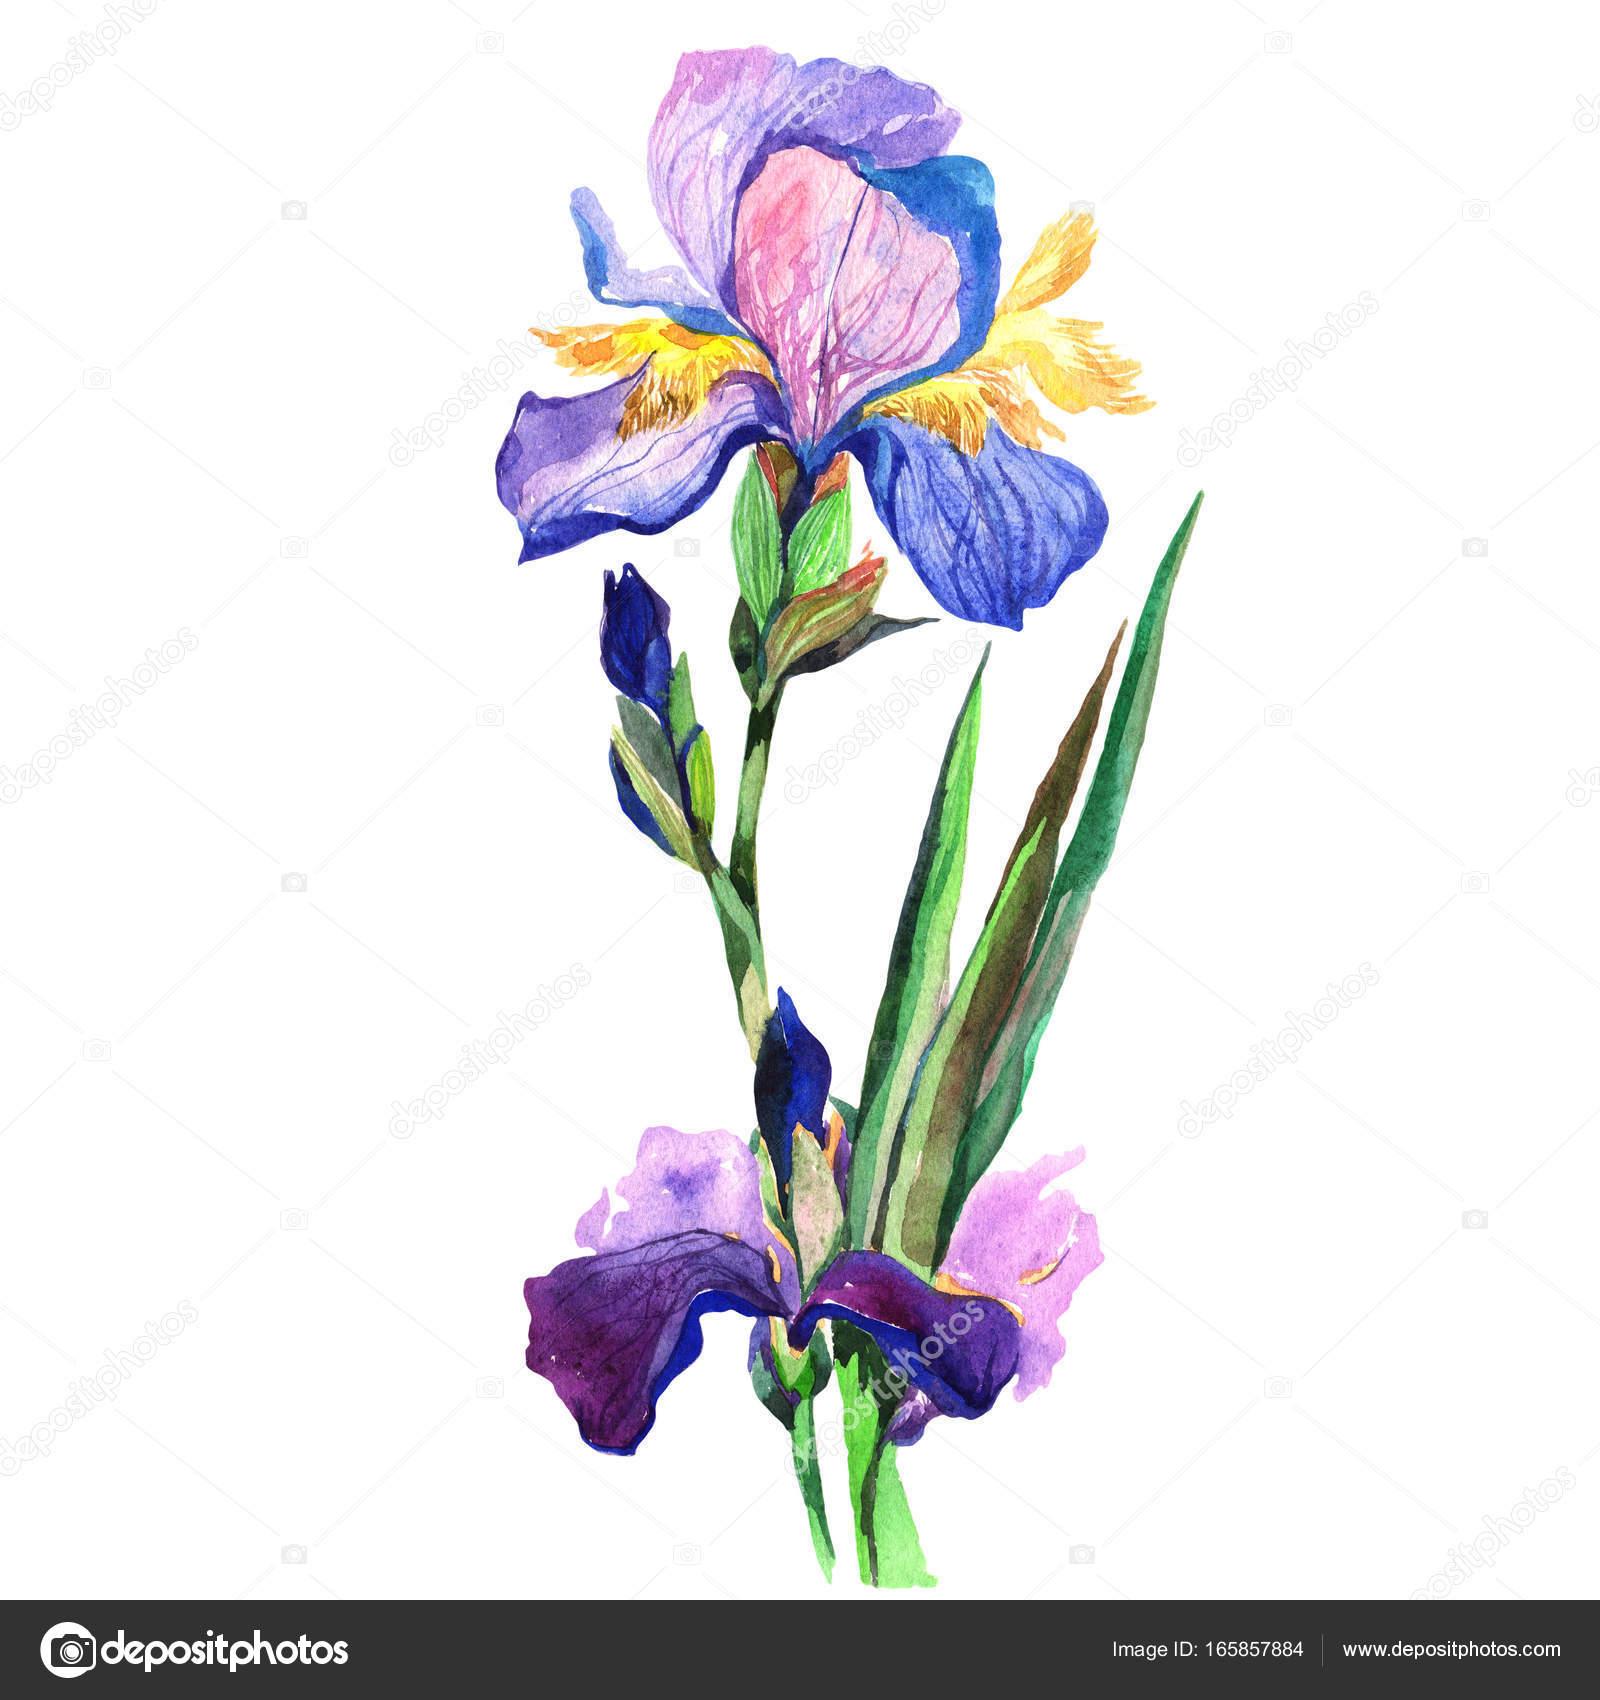 Wildflower iris flower in a watercolor style isolated stock photo wildflower iris flower in a watercolor style isolated full name of the plant fleur de lis aquarelle wild flower for background texture wrapper pattern izmirmasajfo